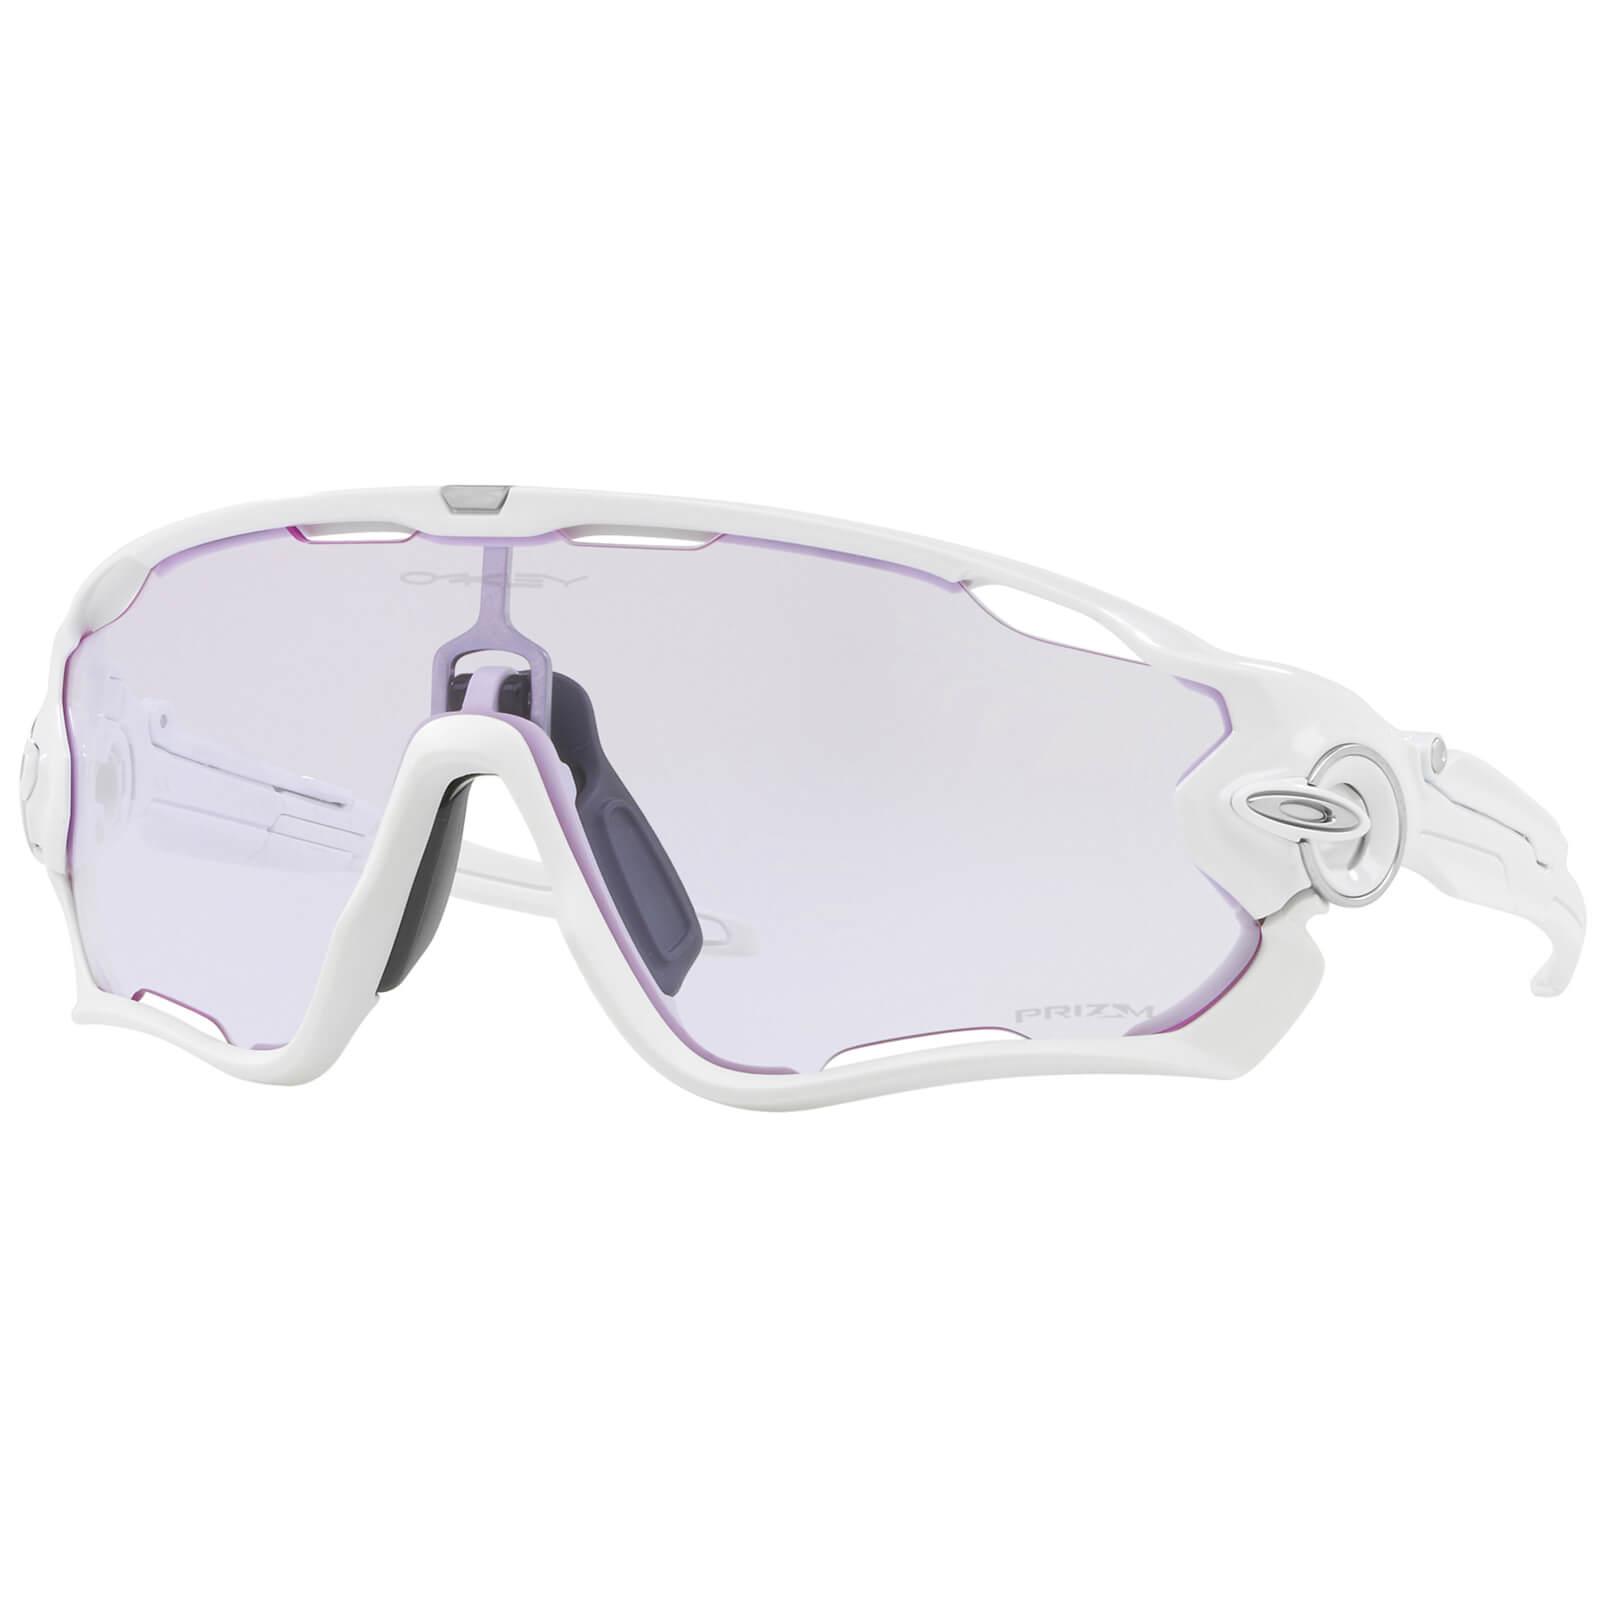 9c190ff9ca Oakley Jawbreaker Sunglasses - Polished White Prizm Low Light ...